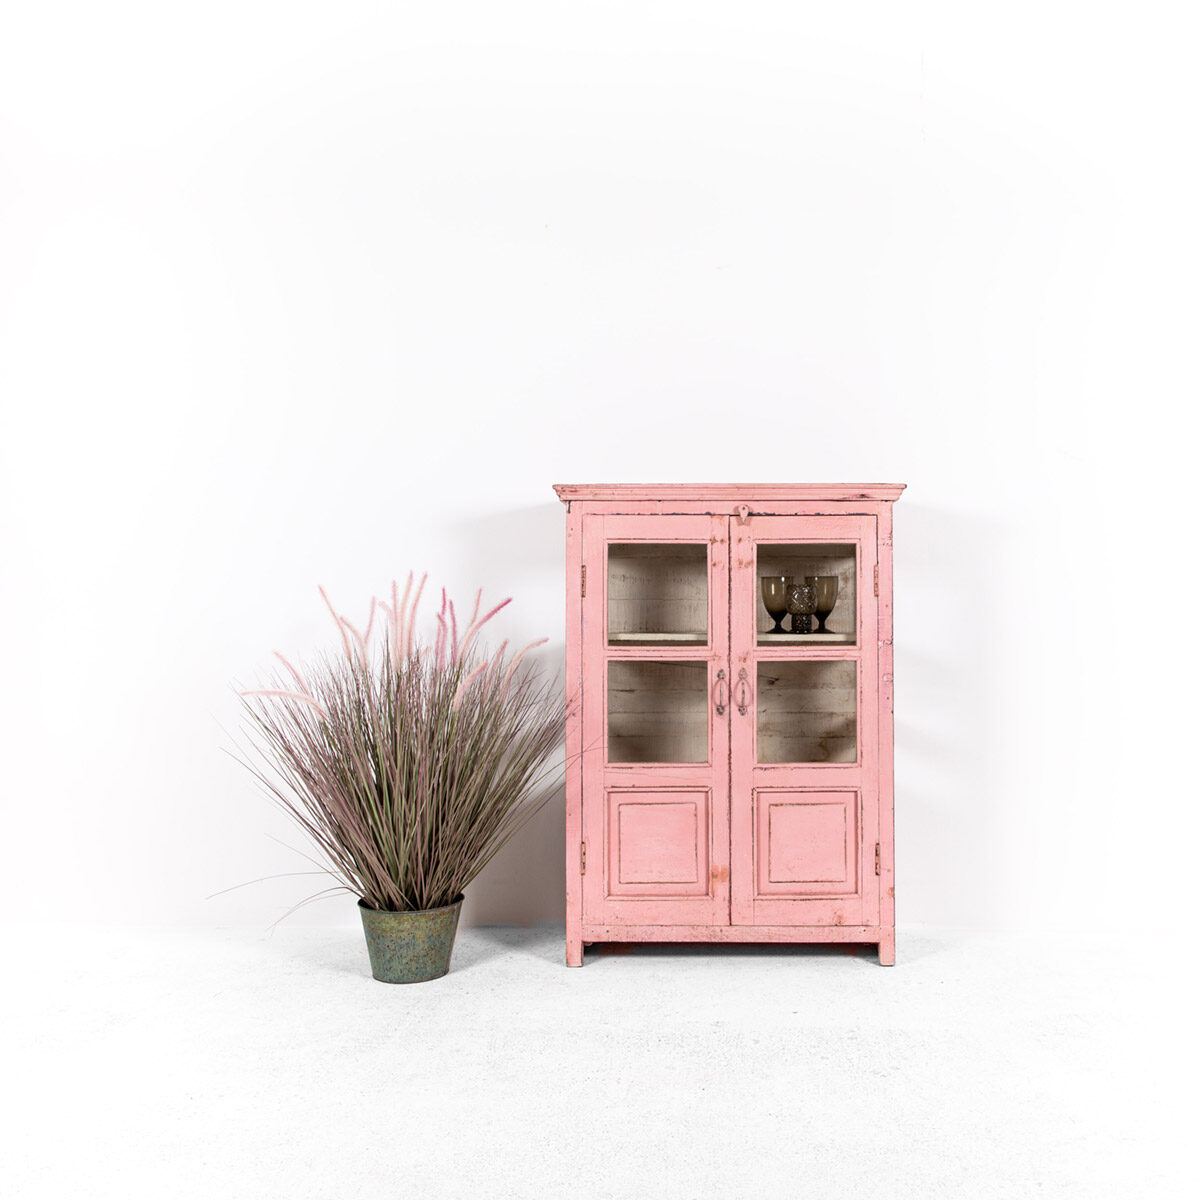 Roze-vitrinekast-2-glazen-deuren-1